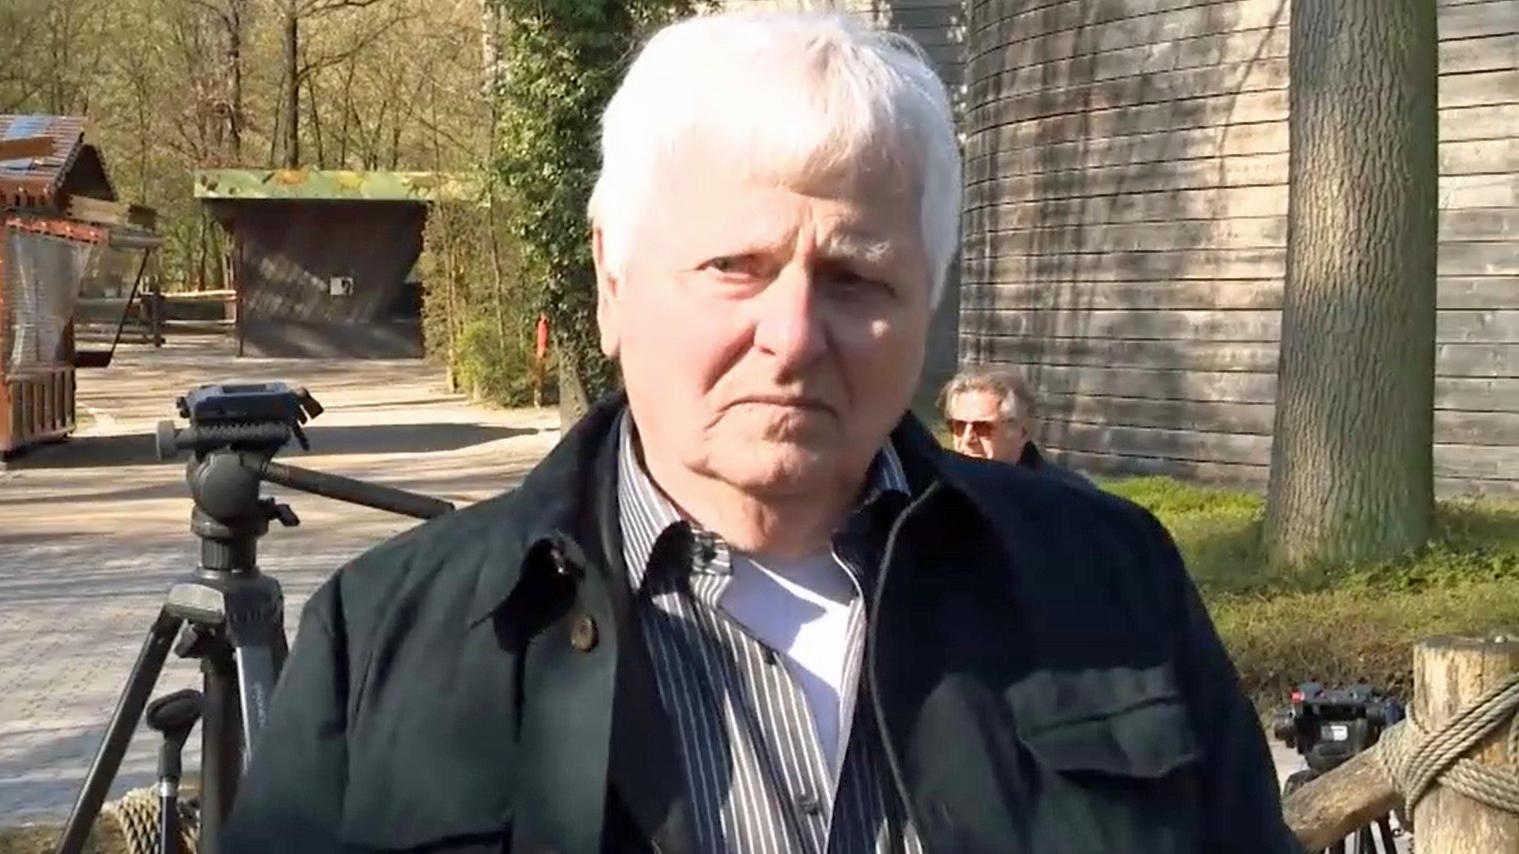 Rentner (82) spendet 1 Million für Flutopfer